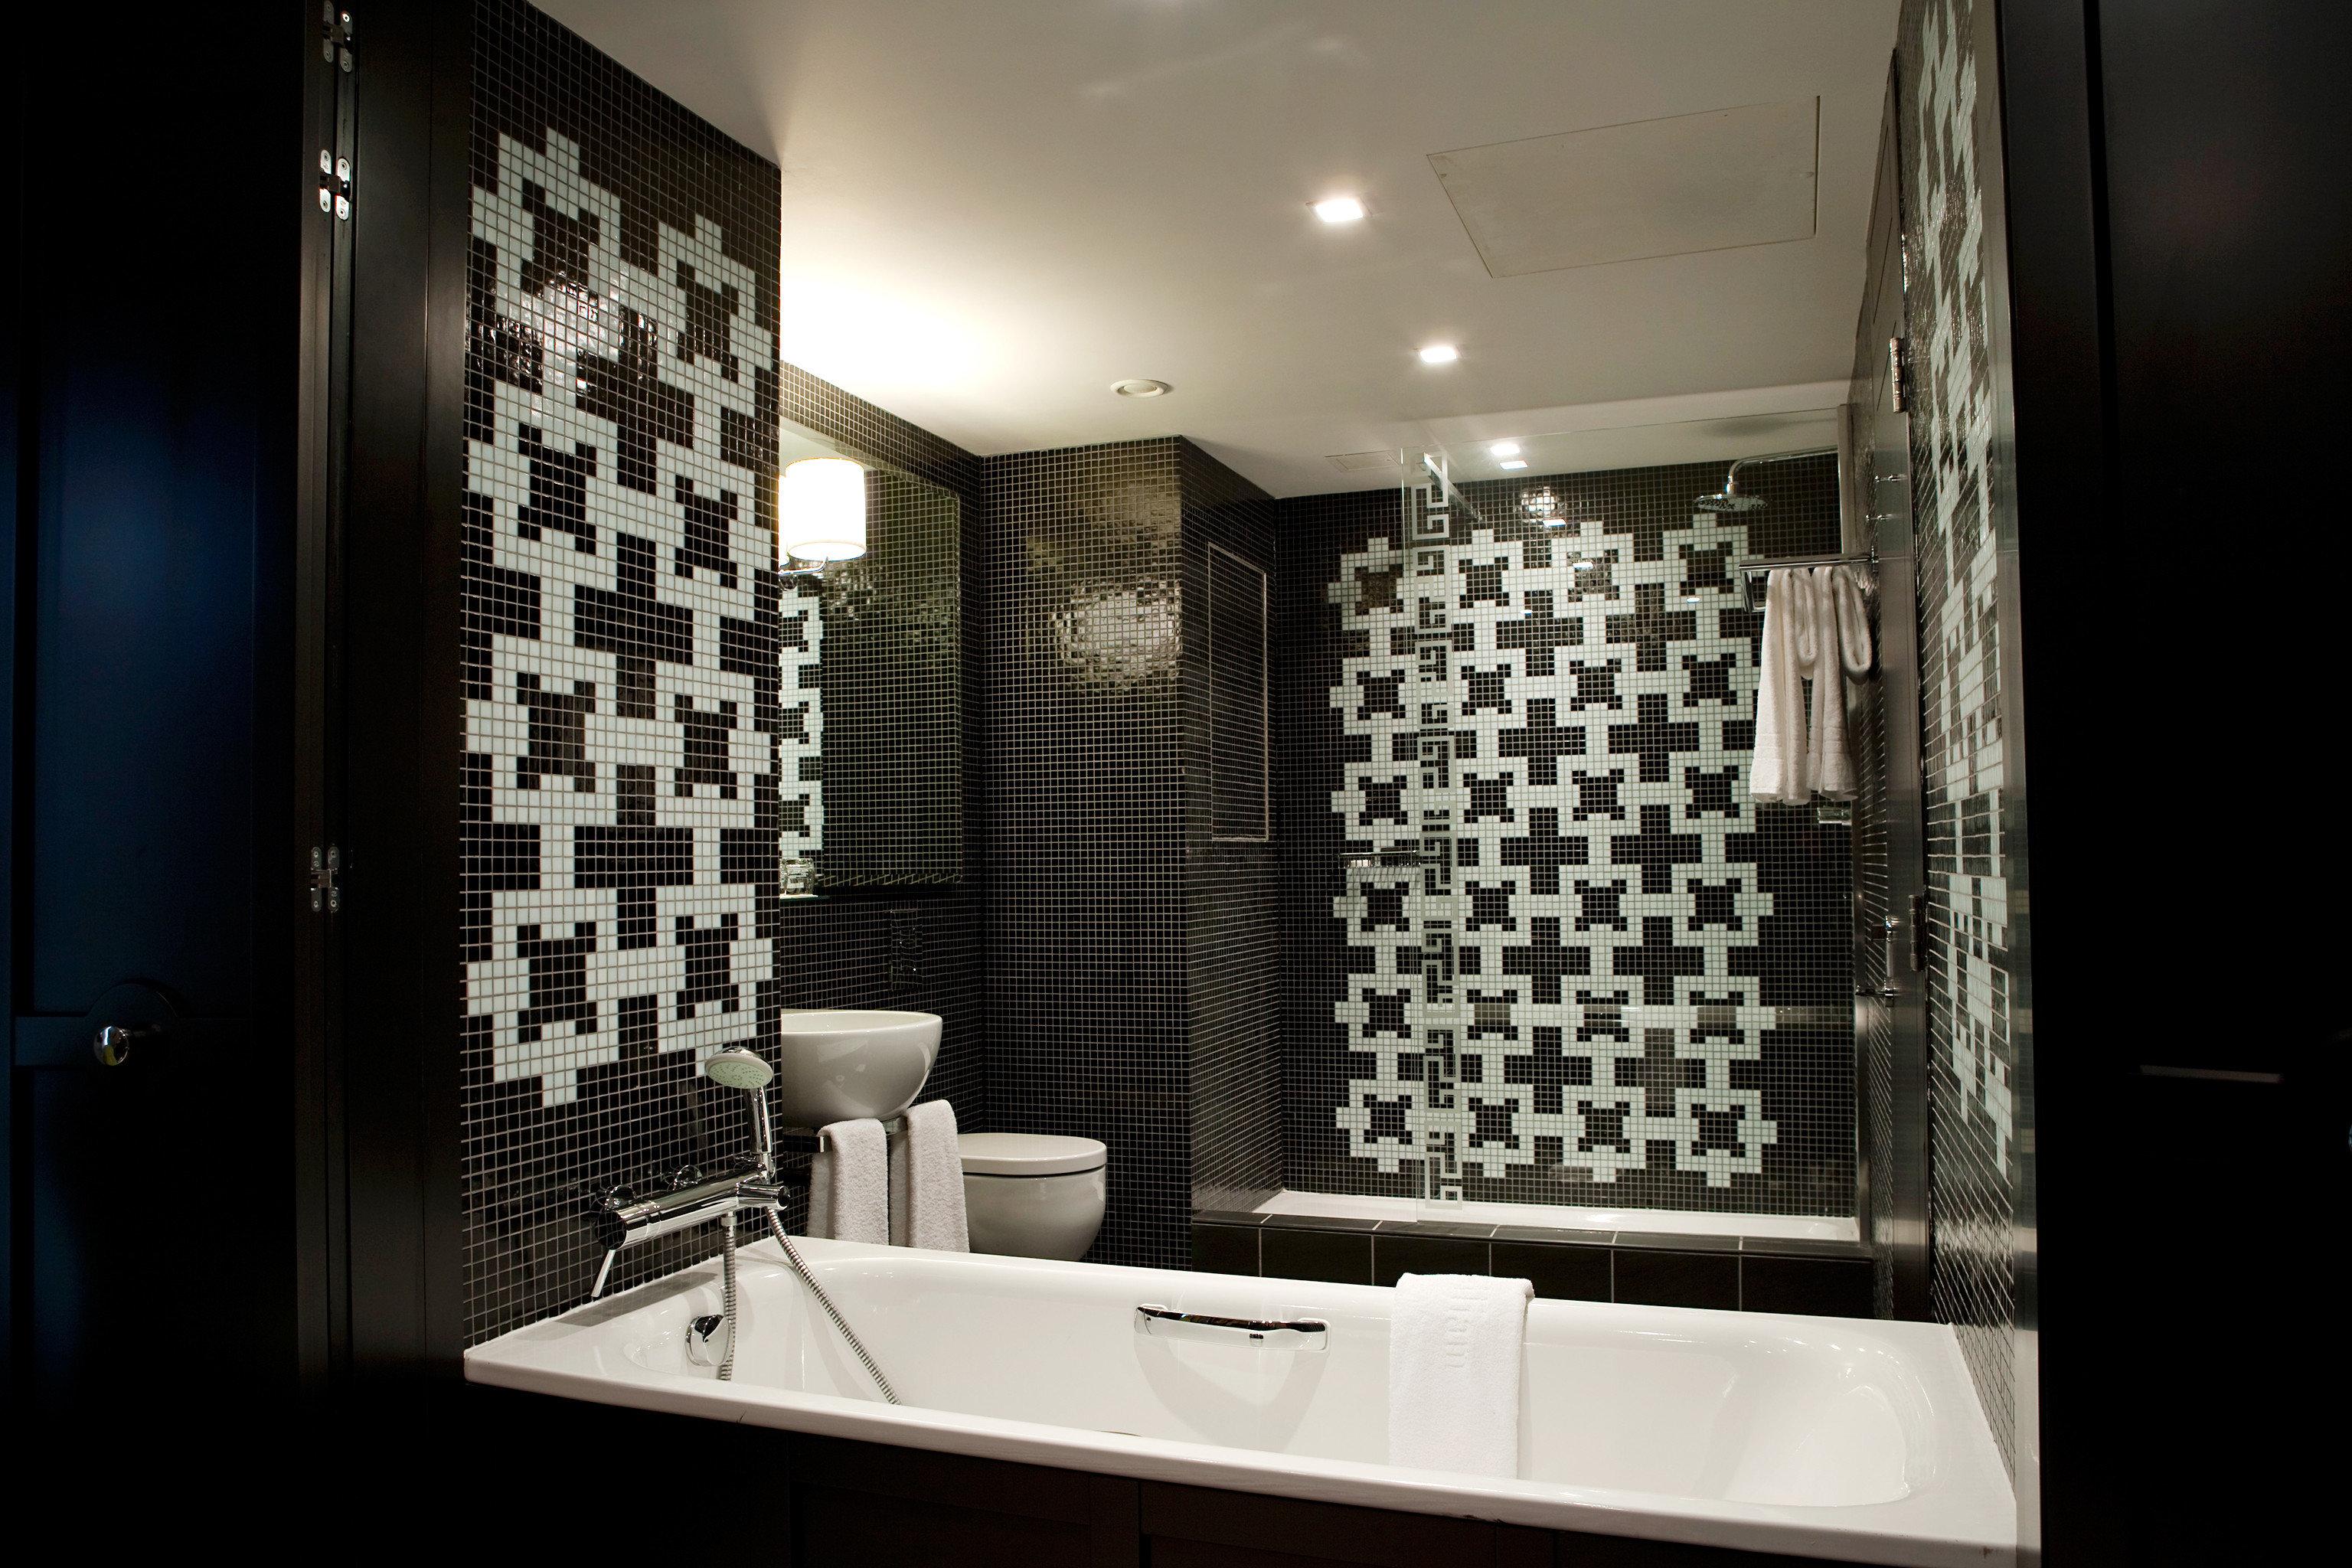 Bath Lounge Luxury Modern bathroom black lighting home tiled